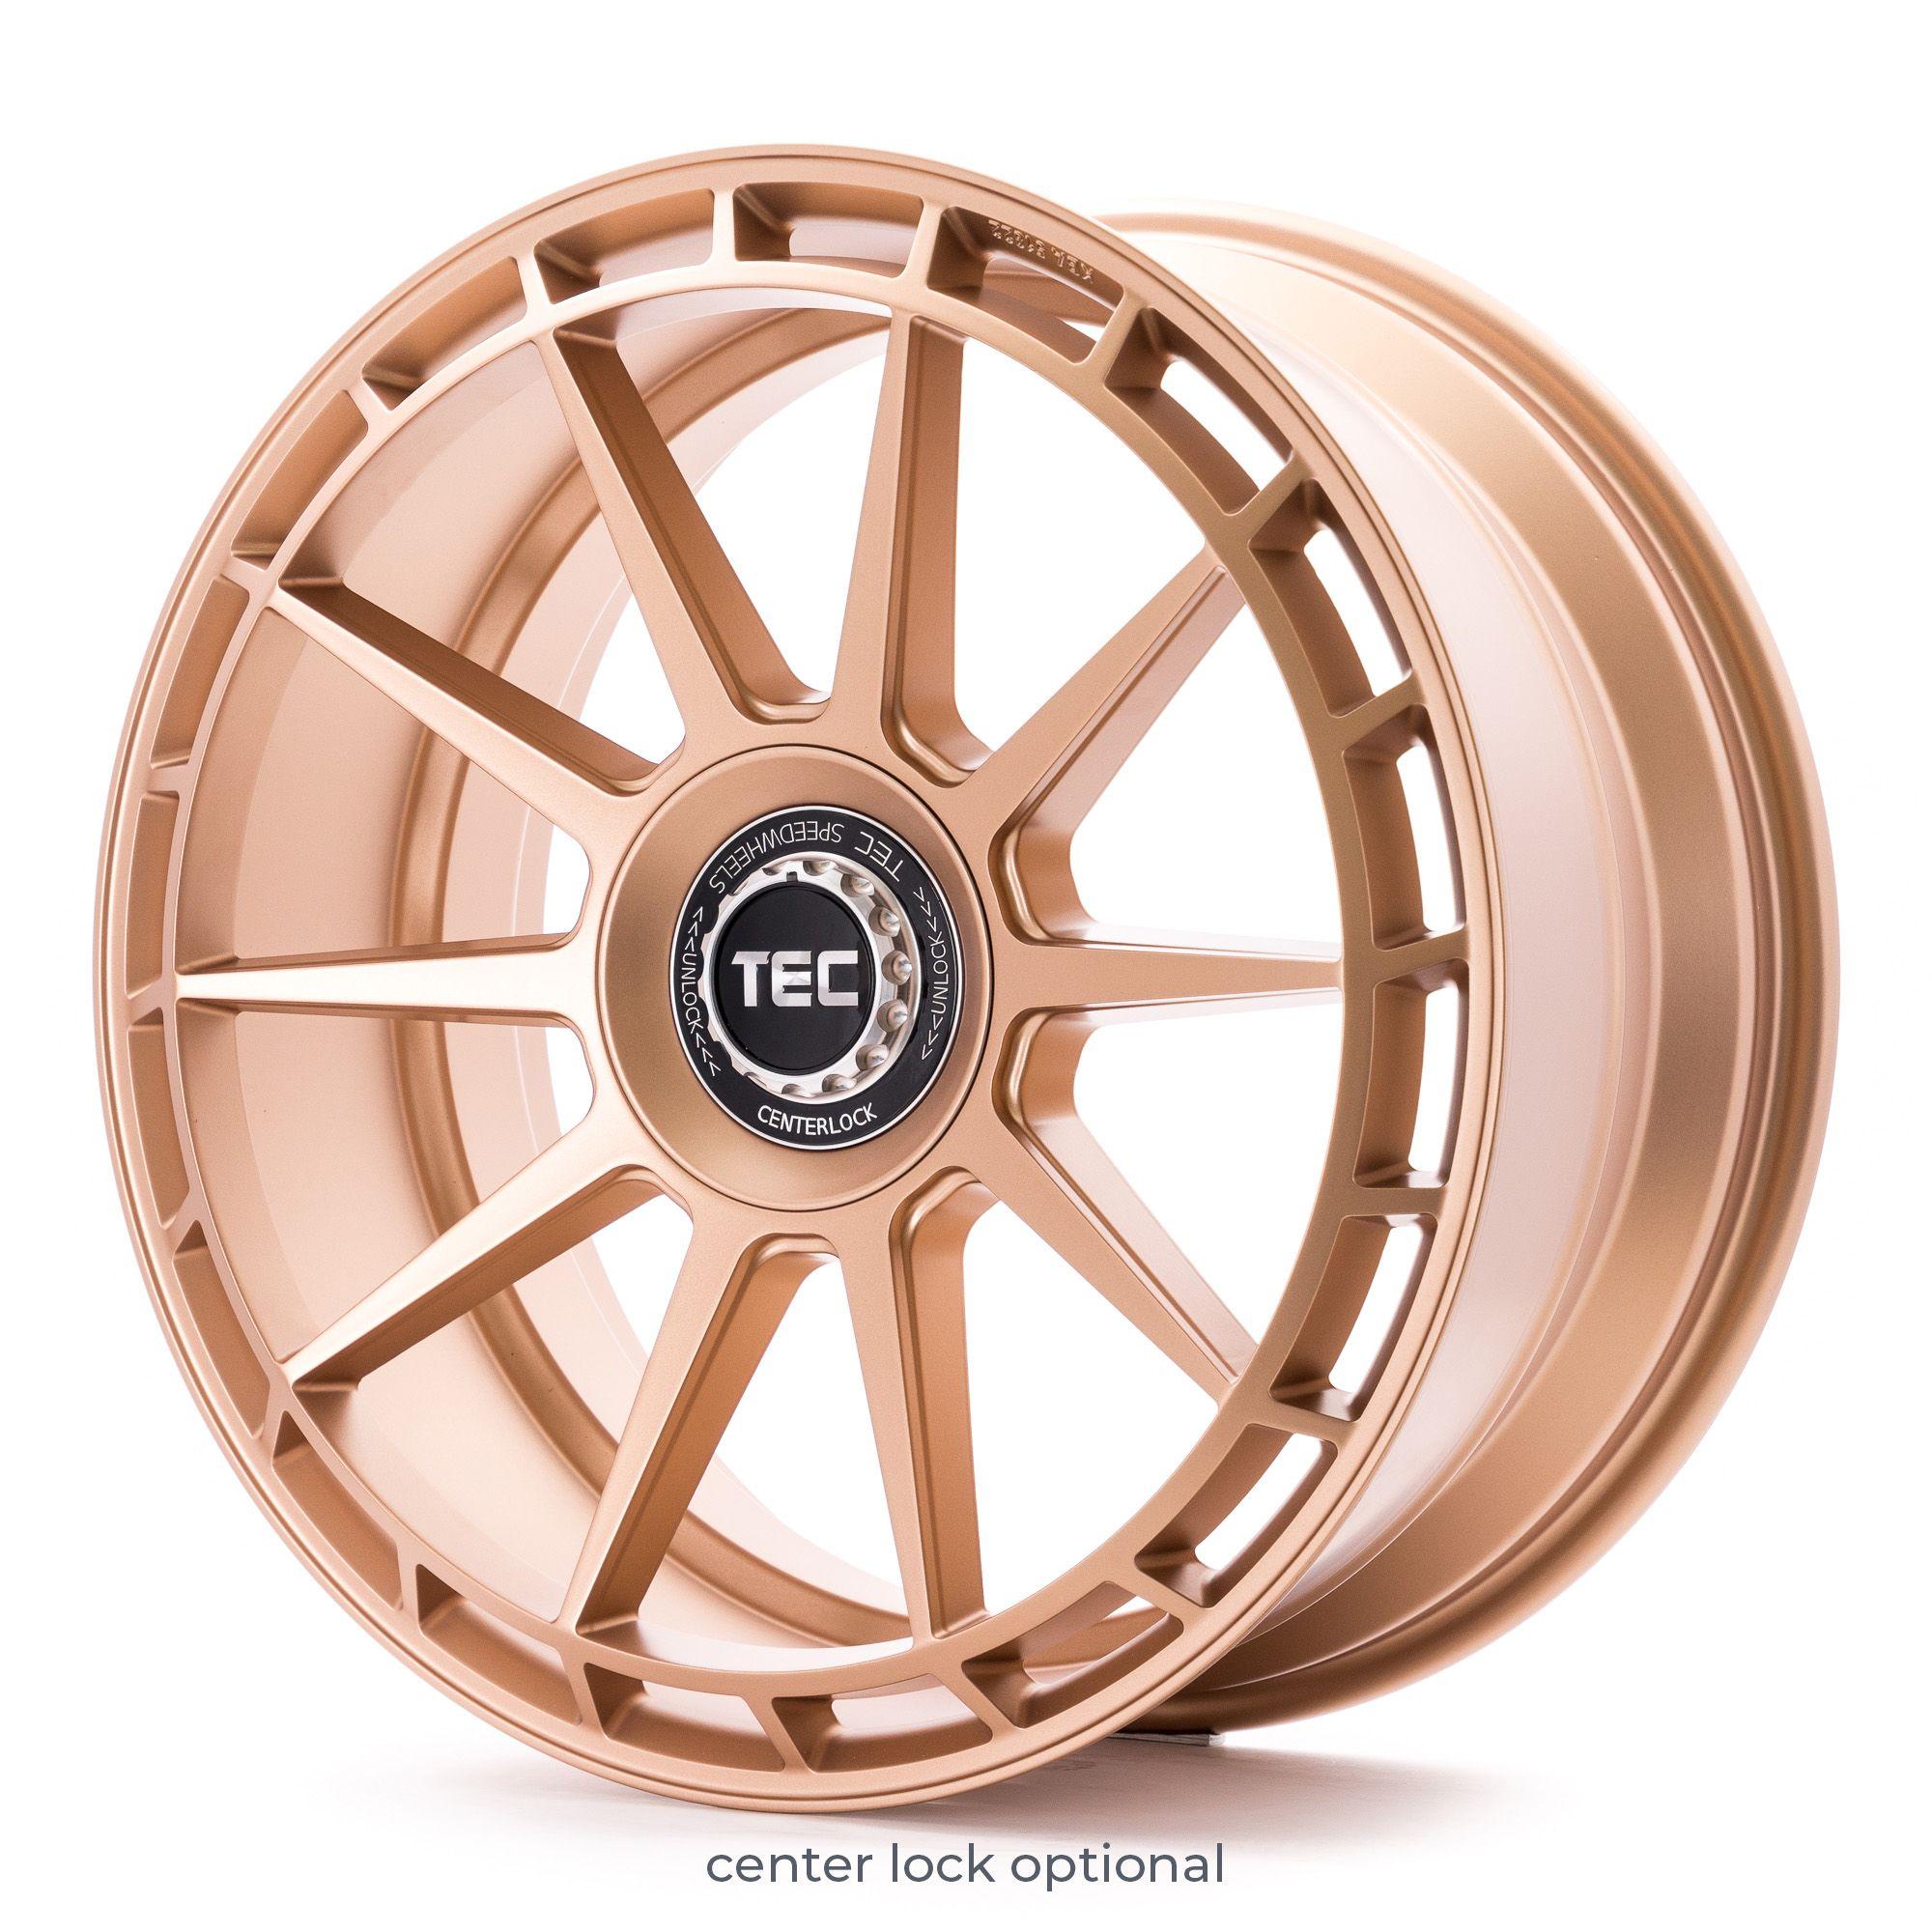 tec speedwheels gt8 felgen ros gold in 19 zoll. Black Bedroom Furniture Sets. Home Design Ideas